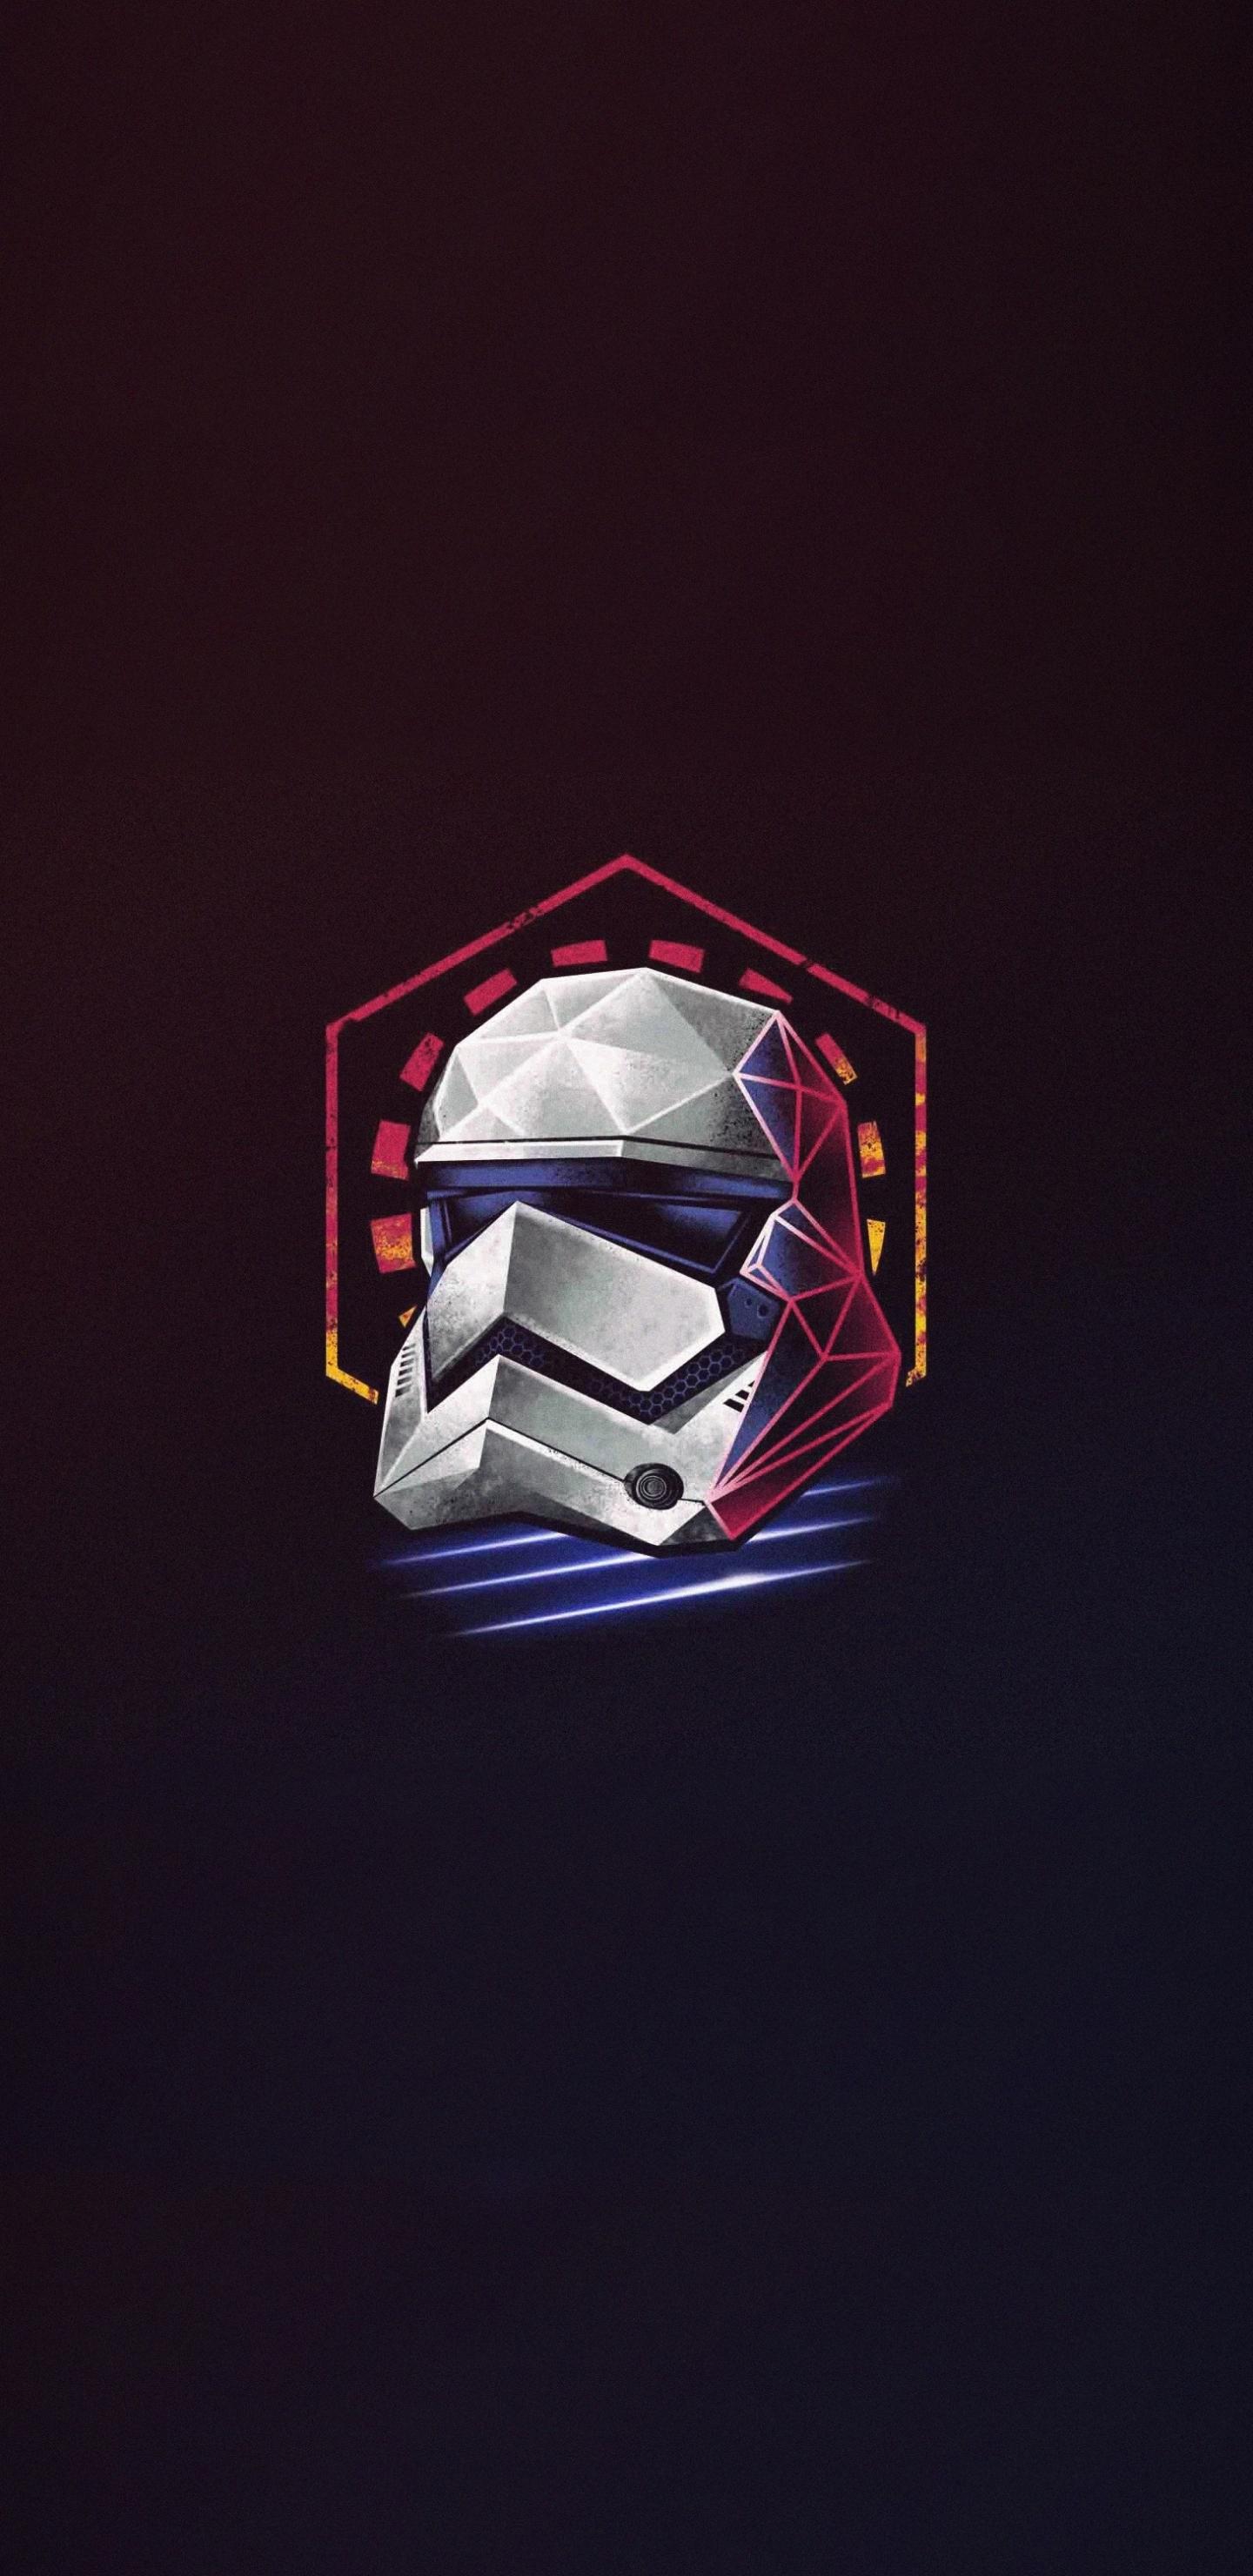 Download 1440x2960 Wallpaper Minimal Star Wars Stormtrooper Helmet Artwork Samsung Galaxy S8 Samsung Galaxy S8 Plus 1440x2960 Hd Image Background 15101